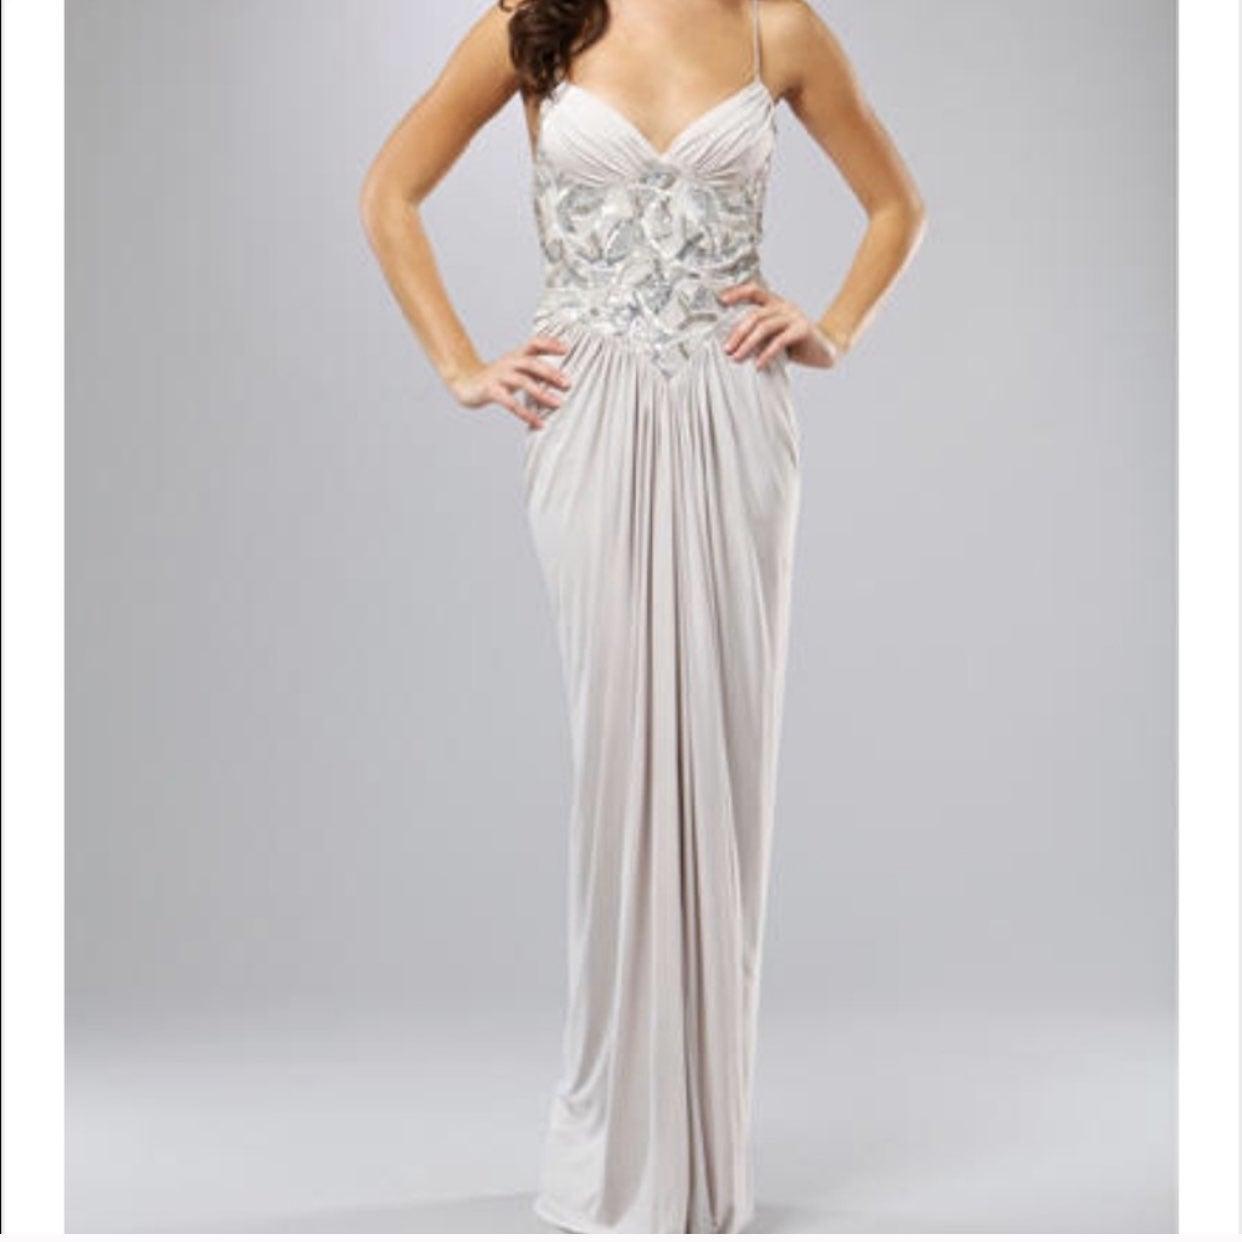 Size 0 Prom Dress